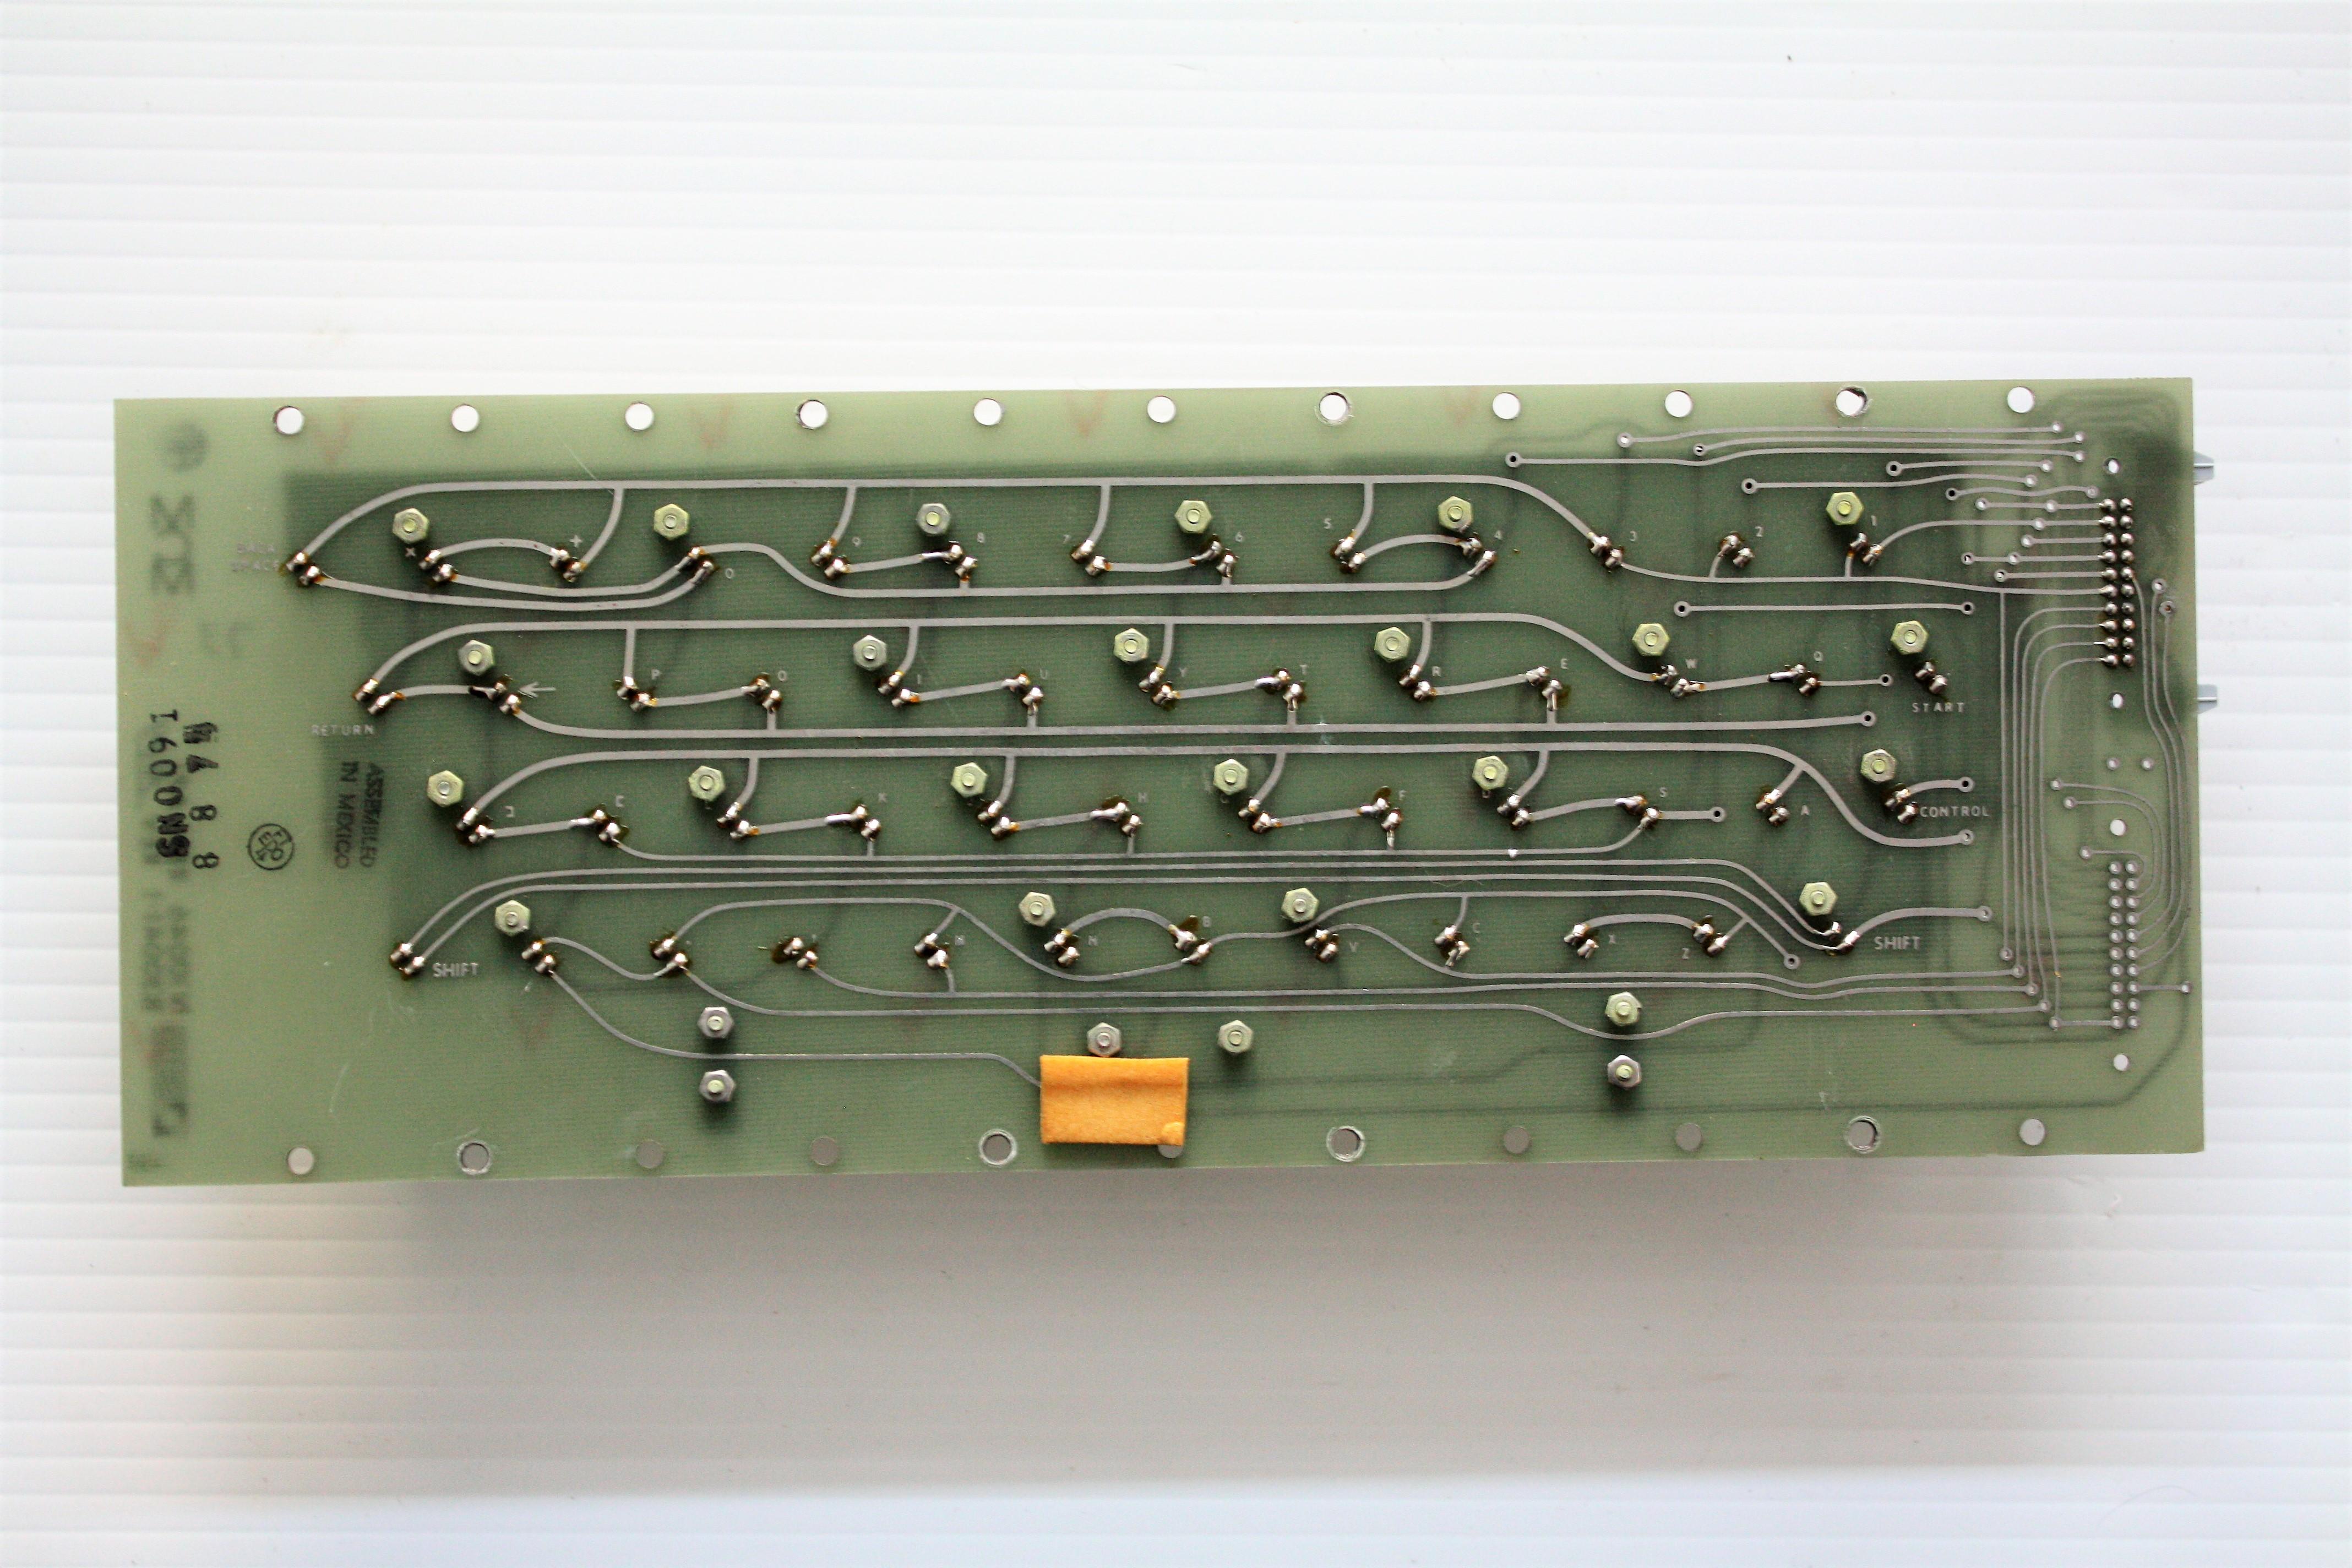 MCM70 - keyboard rear.JPG